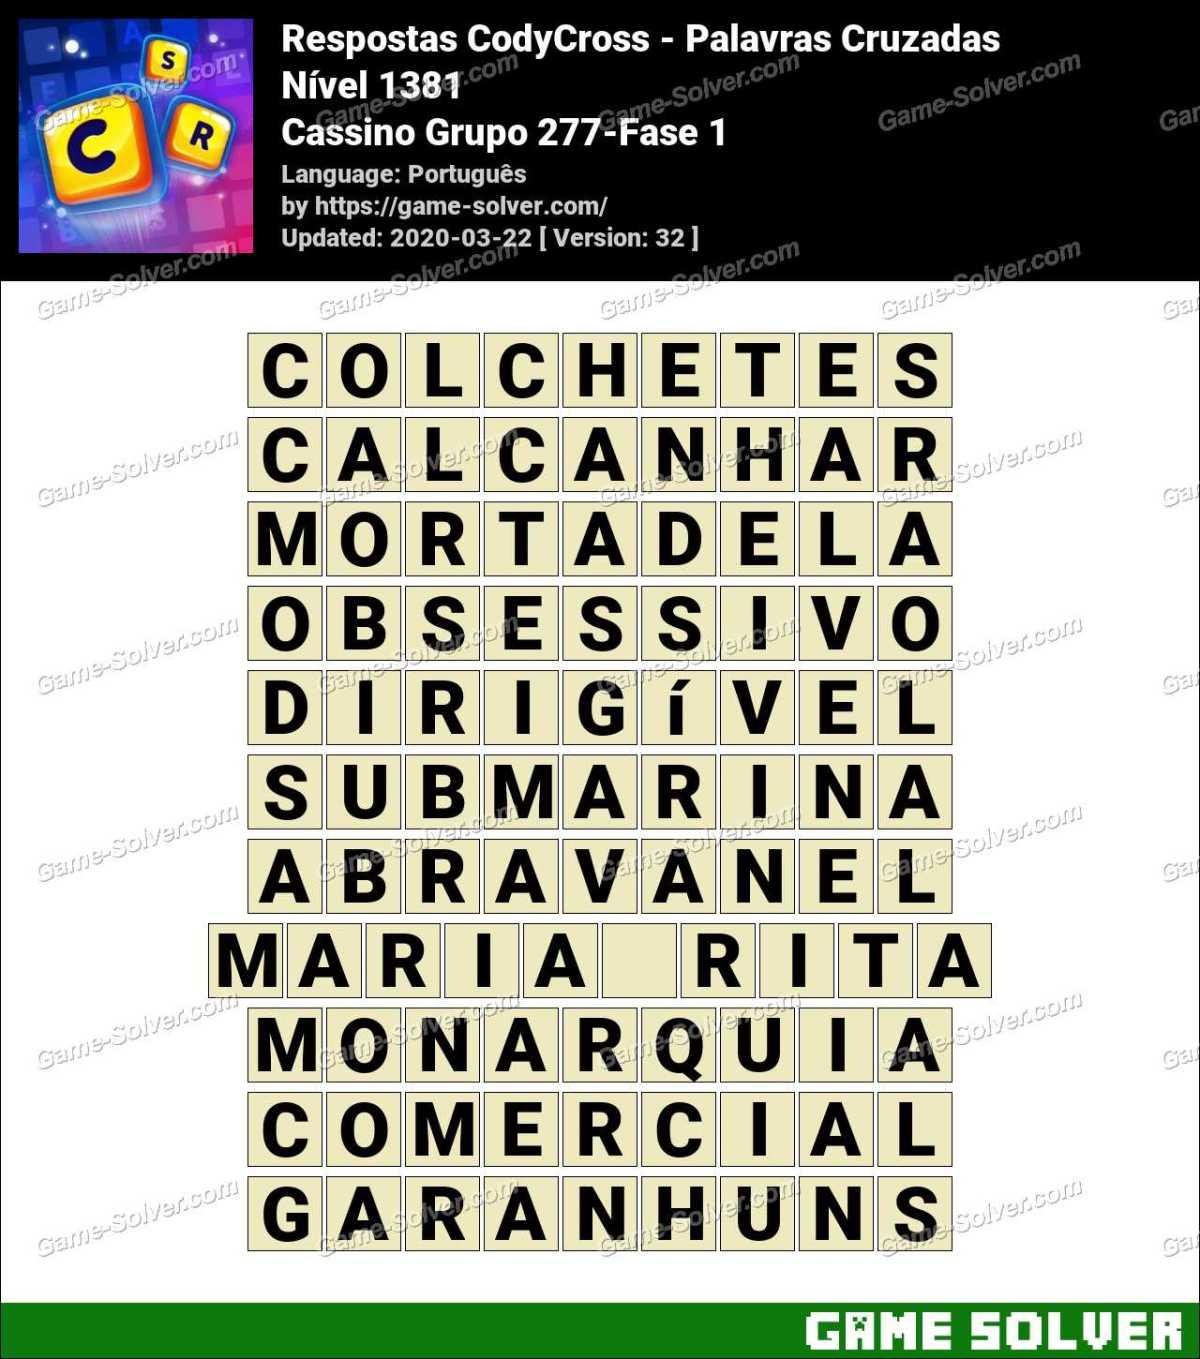 Respostas CodyCross Cassino Grupo 277-Fase 1